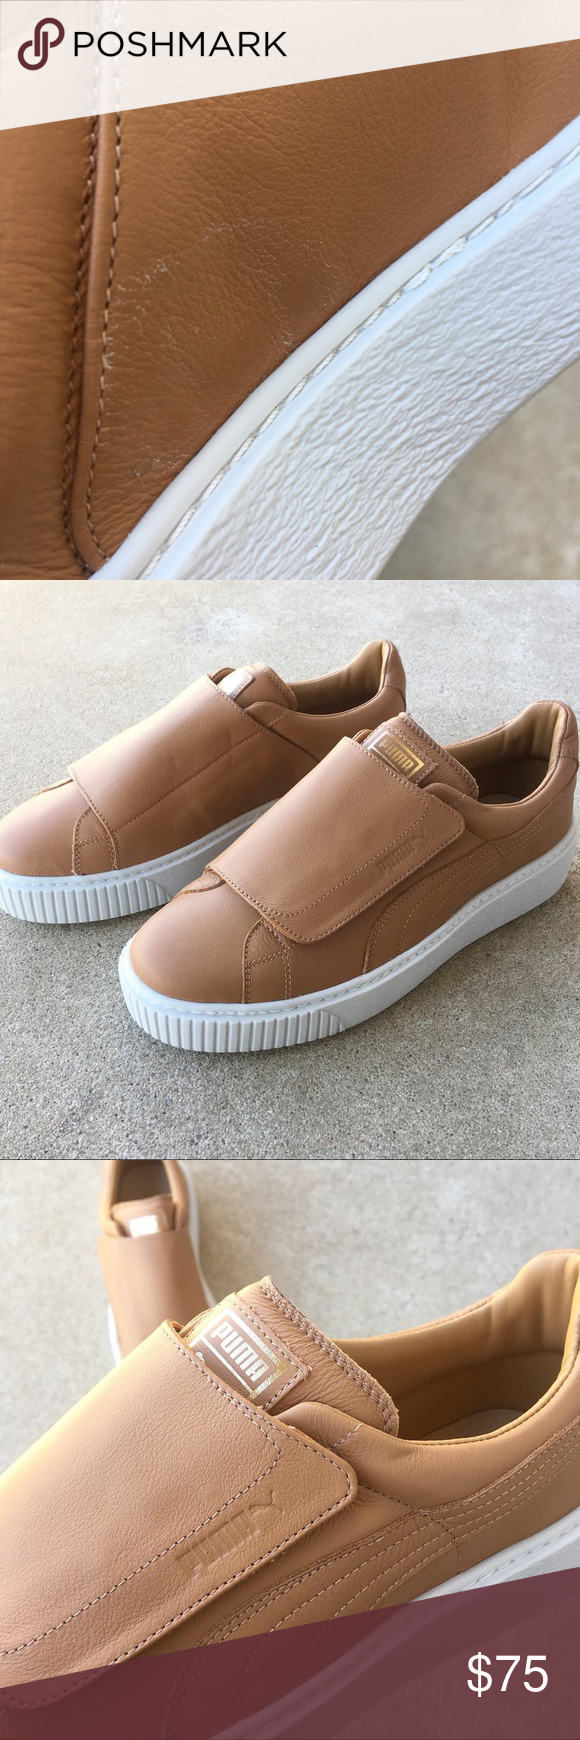 low priced 39928 9a34d Puma Basket Platform Big Strap Women's Sneakers Brand new ...